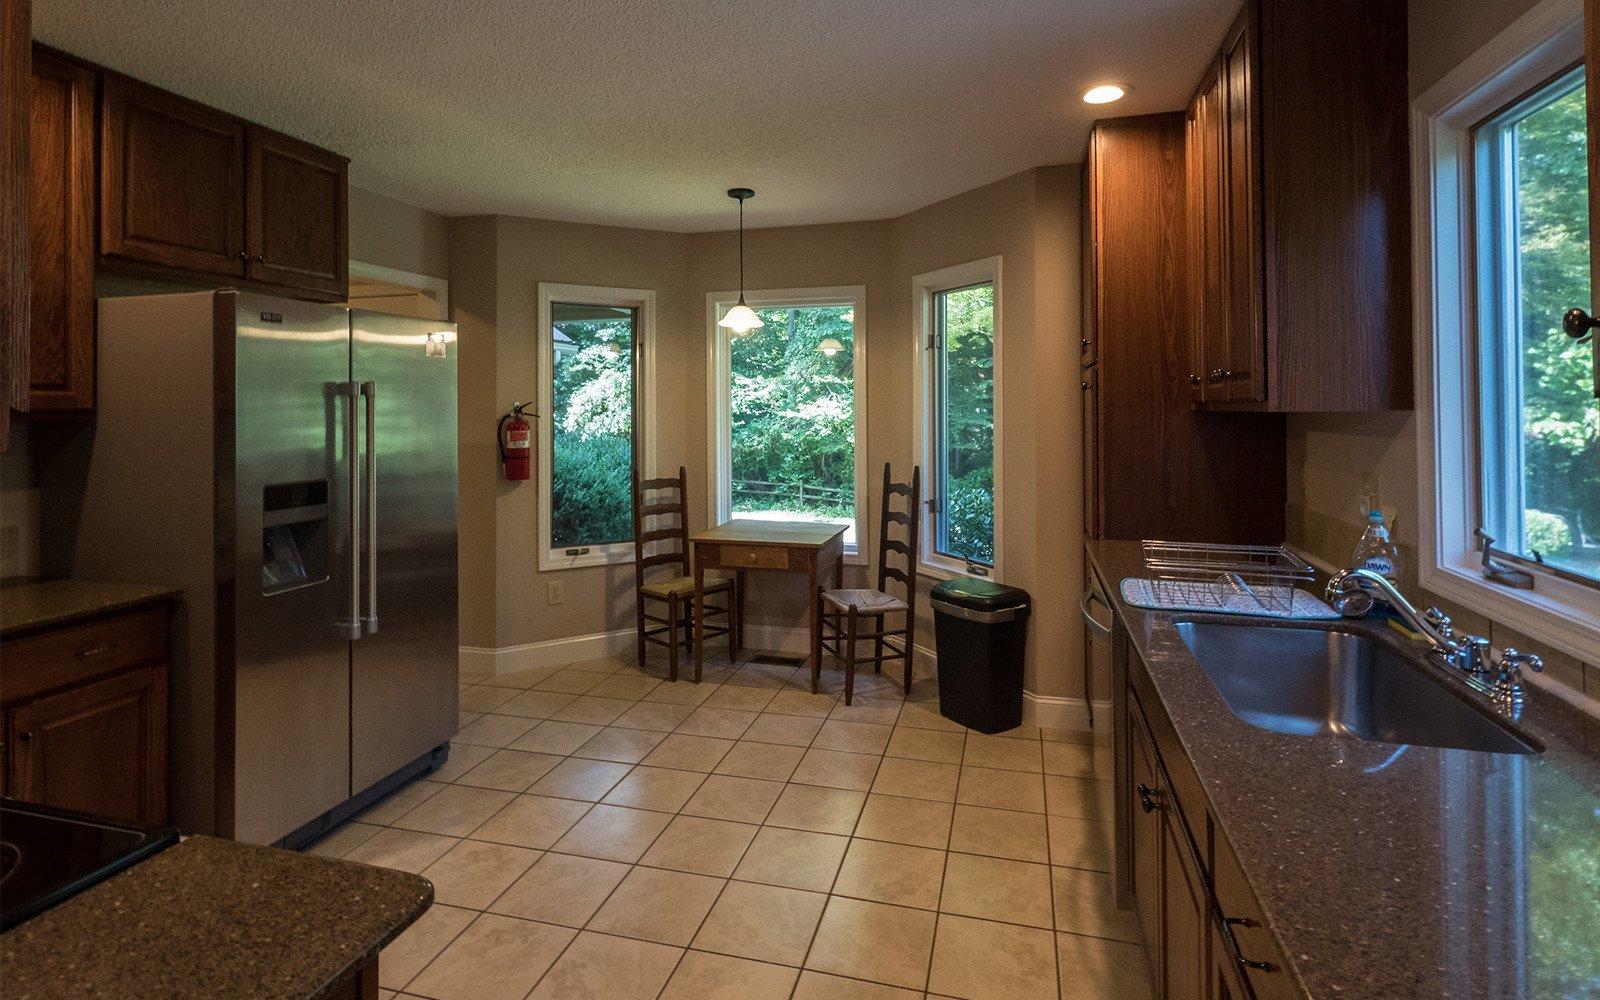 Hilt-Street-house-kitchen-2